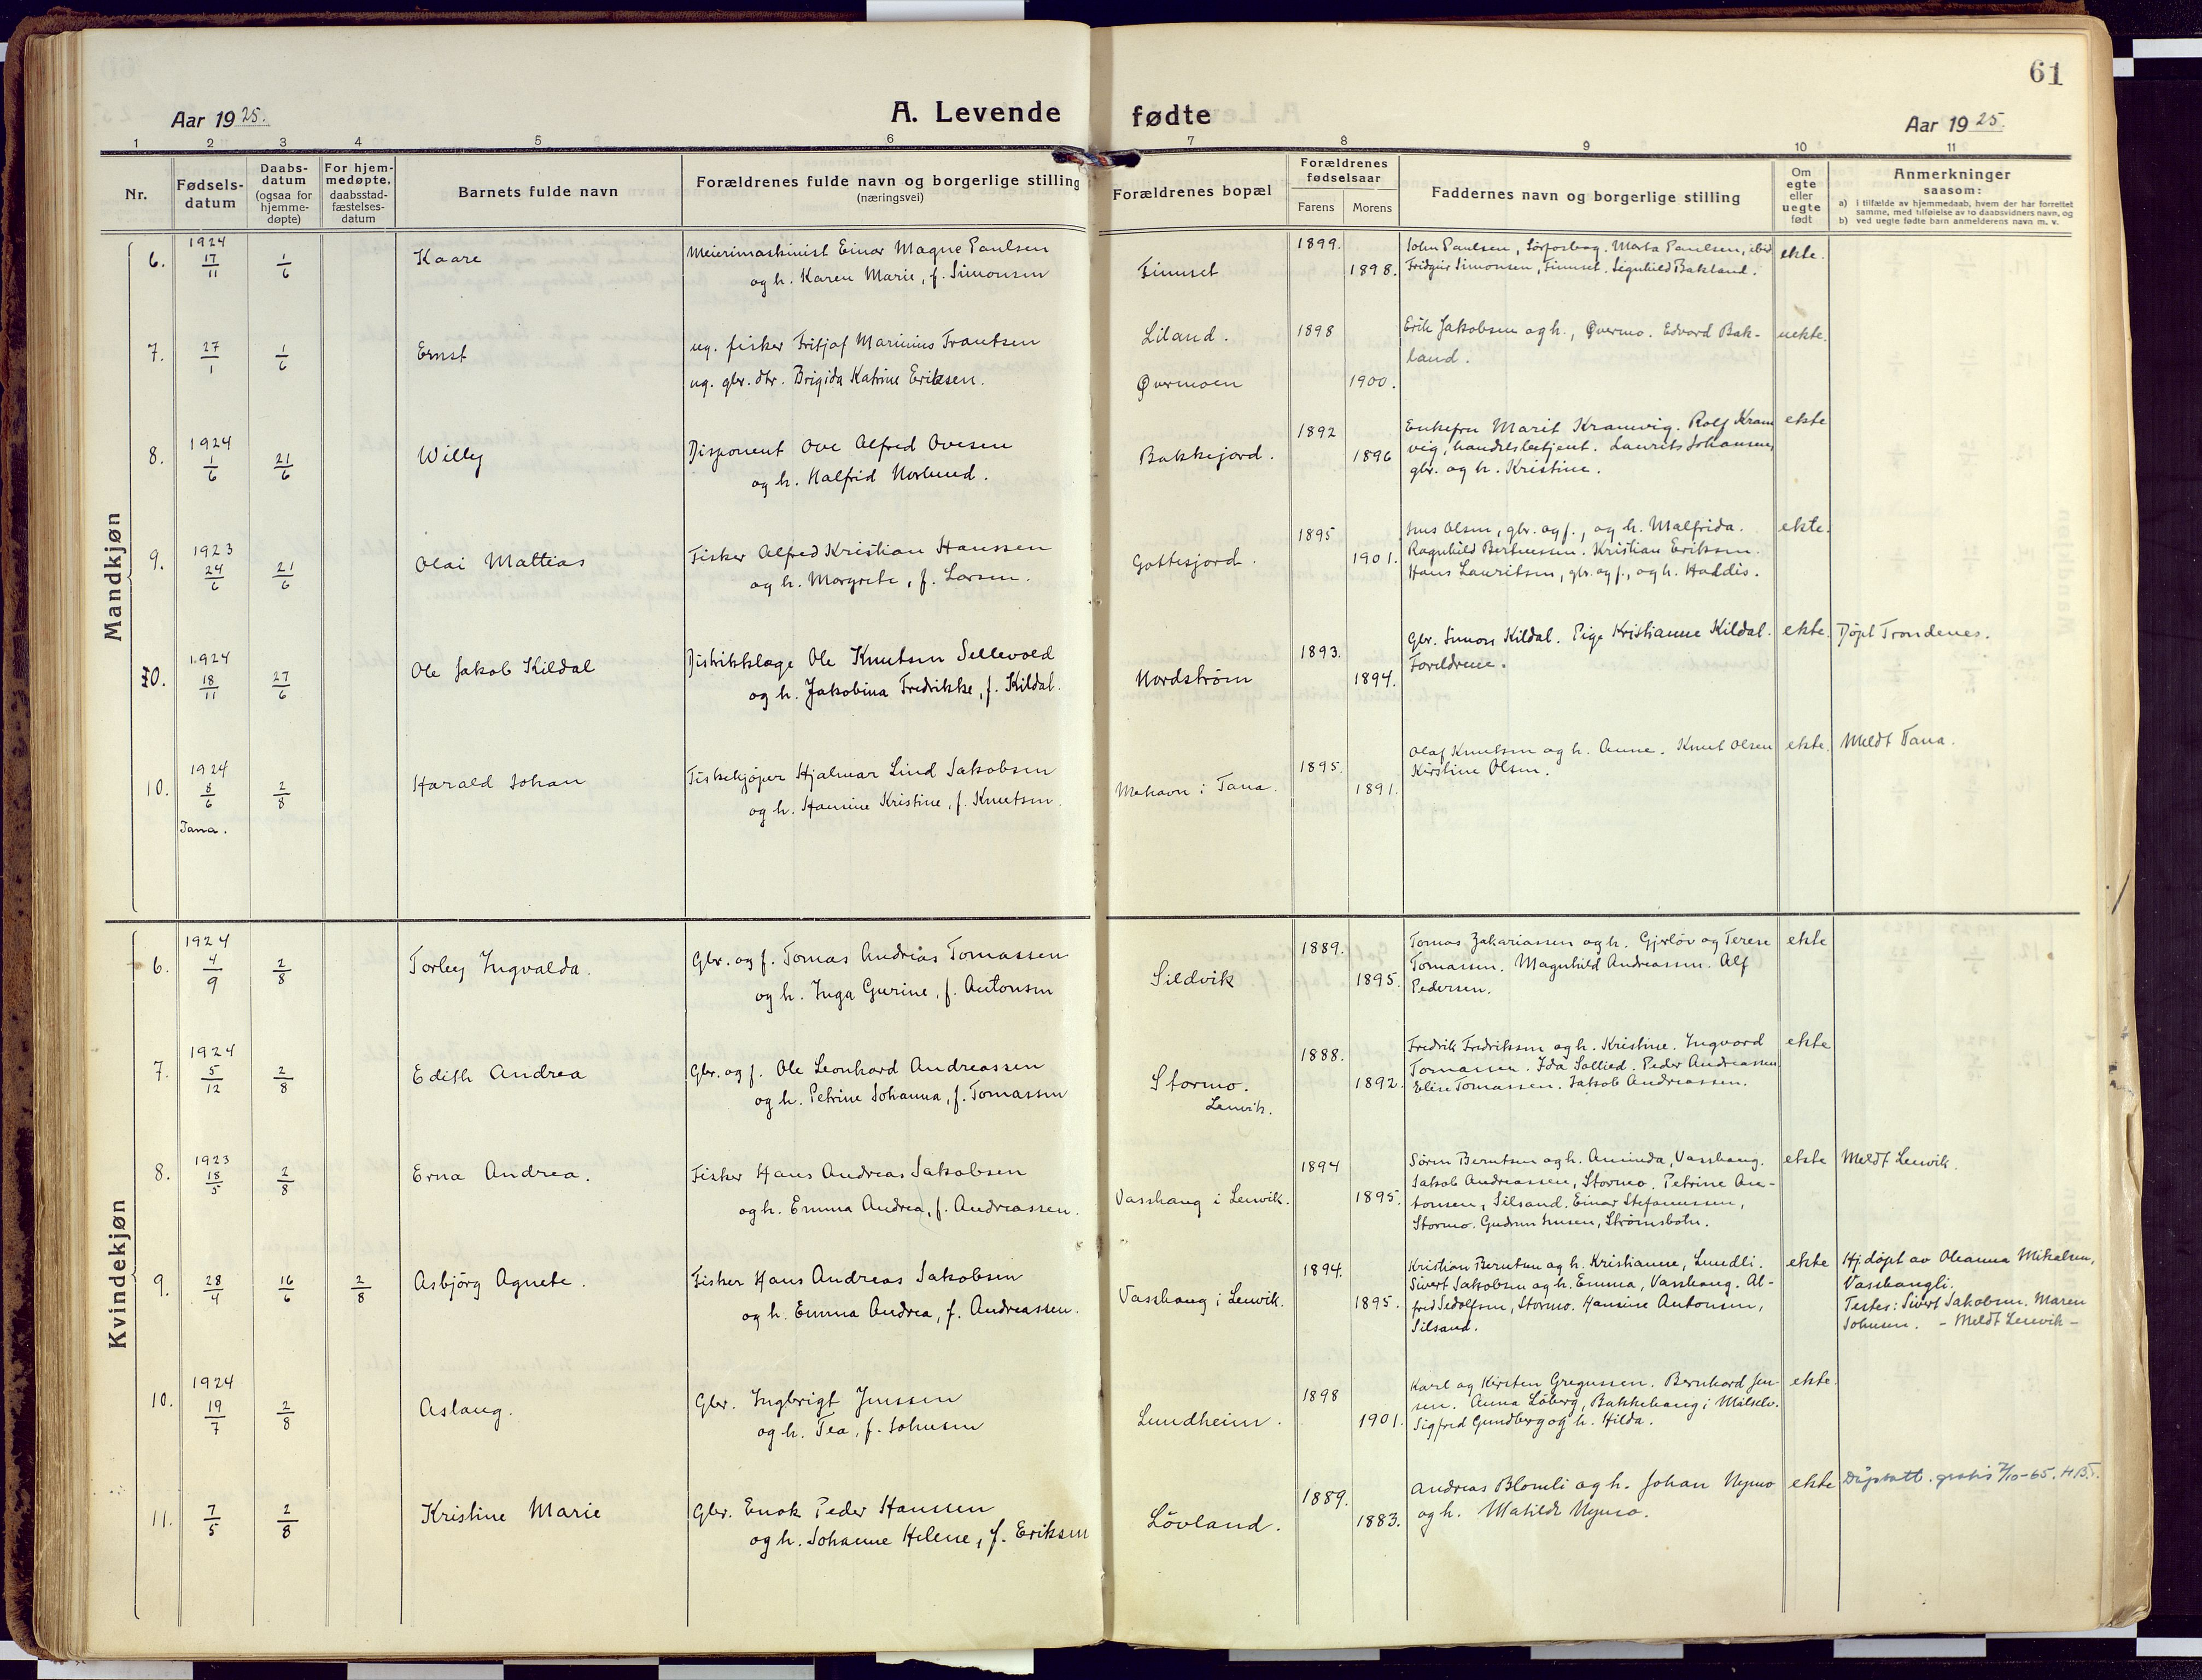 SATØ, Tranøy sokneprestkontor, I/Ia/Iaa/L0015kirke: Ministerialbok nr. 15, 1919-1928, s. 61